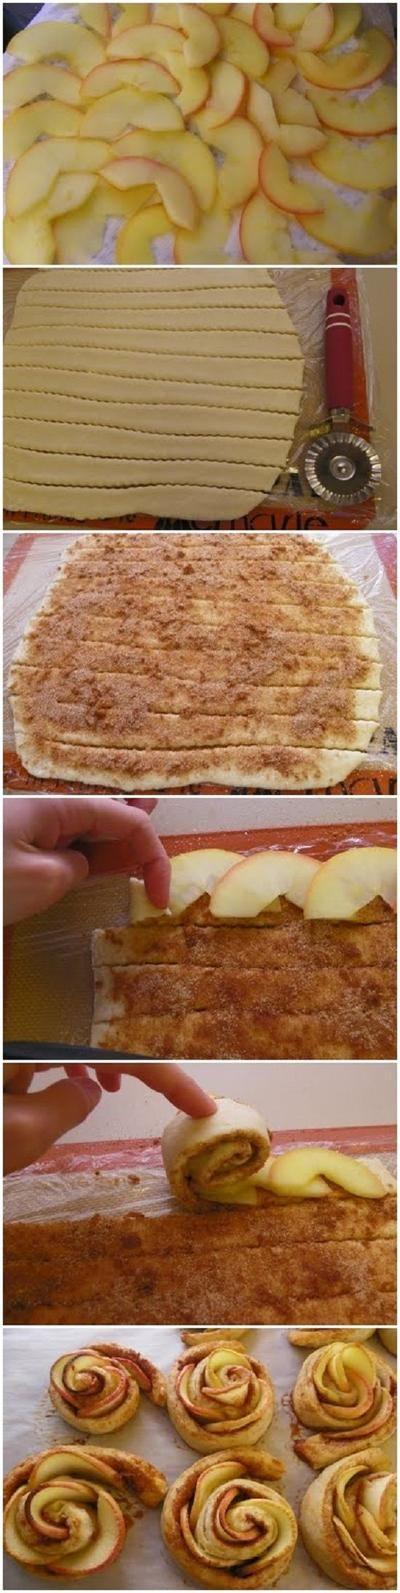 Appel rozen 1 puff pastry sheet 3 apples 5 TBSP sugar or splenda 2 teaspoons cinnamon 1 pinch nutmeg 1 teaspoon lemon zest 4 cups water 3 TBSP sugar 2 TBSP lemon juice -